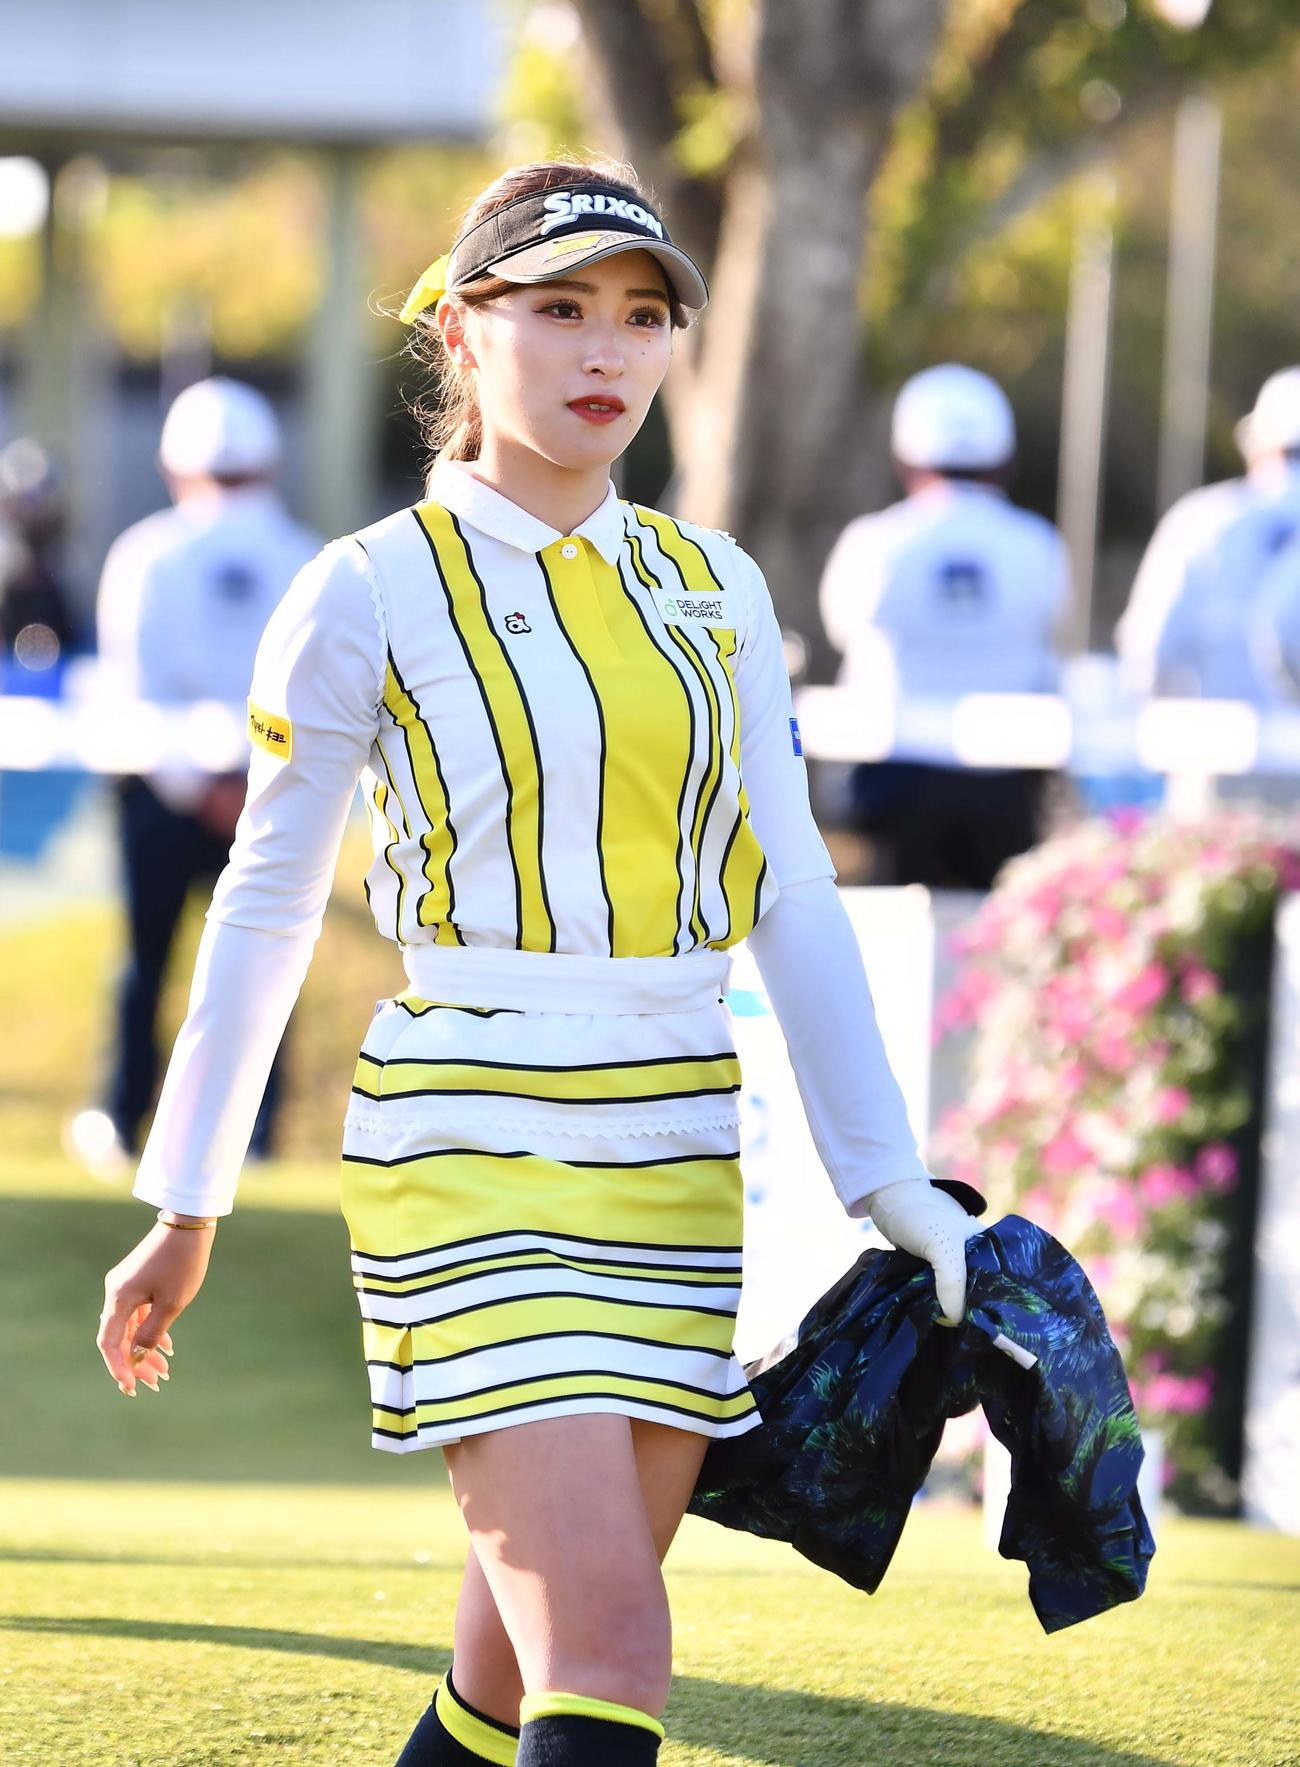 https://www.nikkansports.com/sports/golf/news/img/202103270000223-w1300_2.jpg